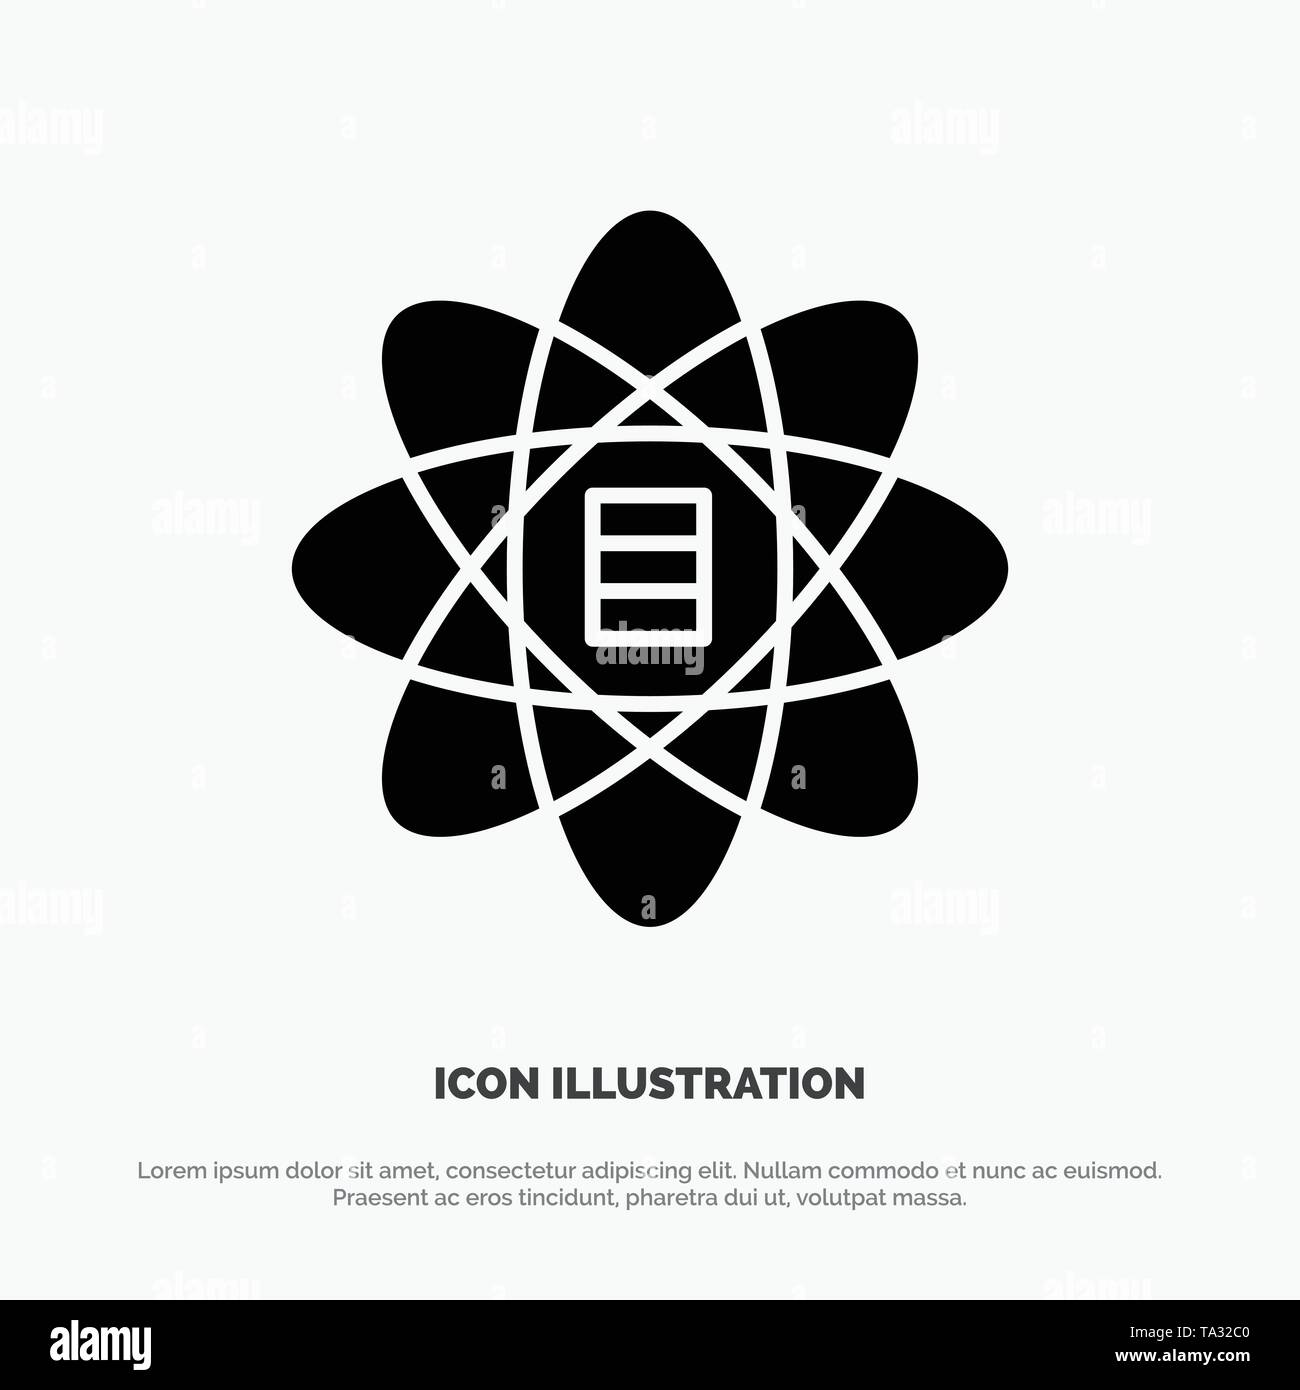 Daten, Wissenschaft, Daten Wissenschaft, Dollar, solide Glyphe Symbol Vektor Stockbild